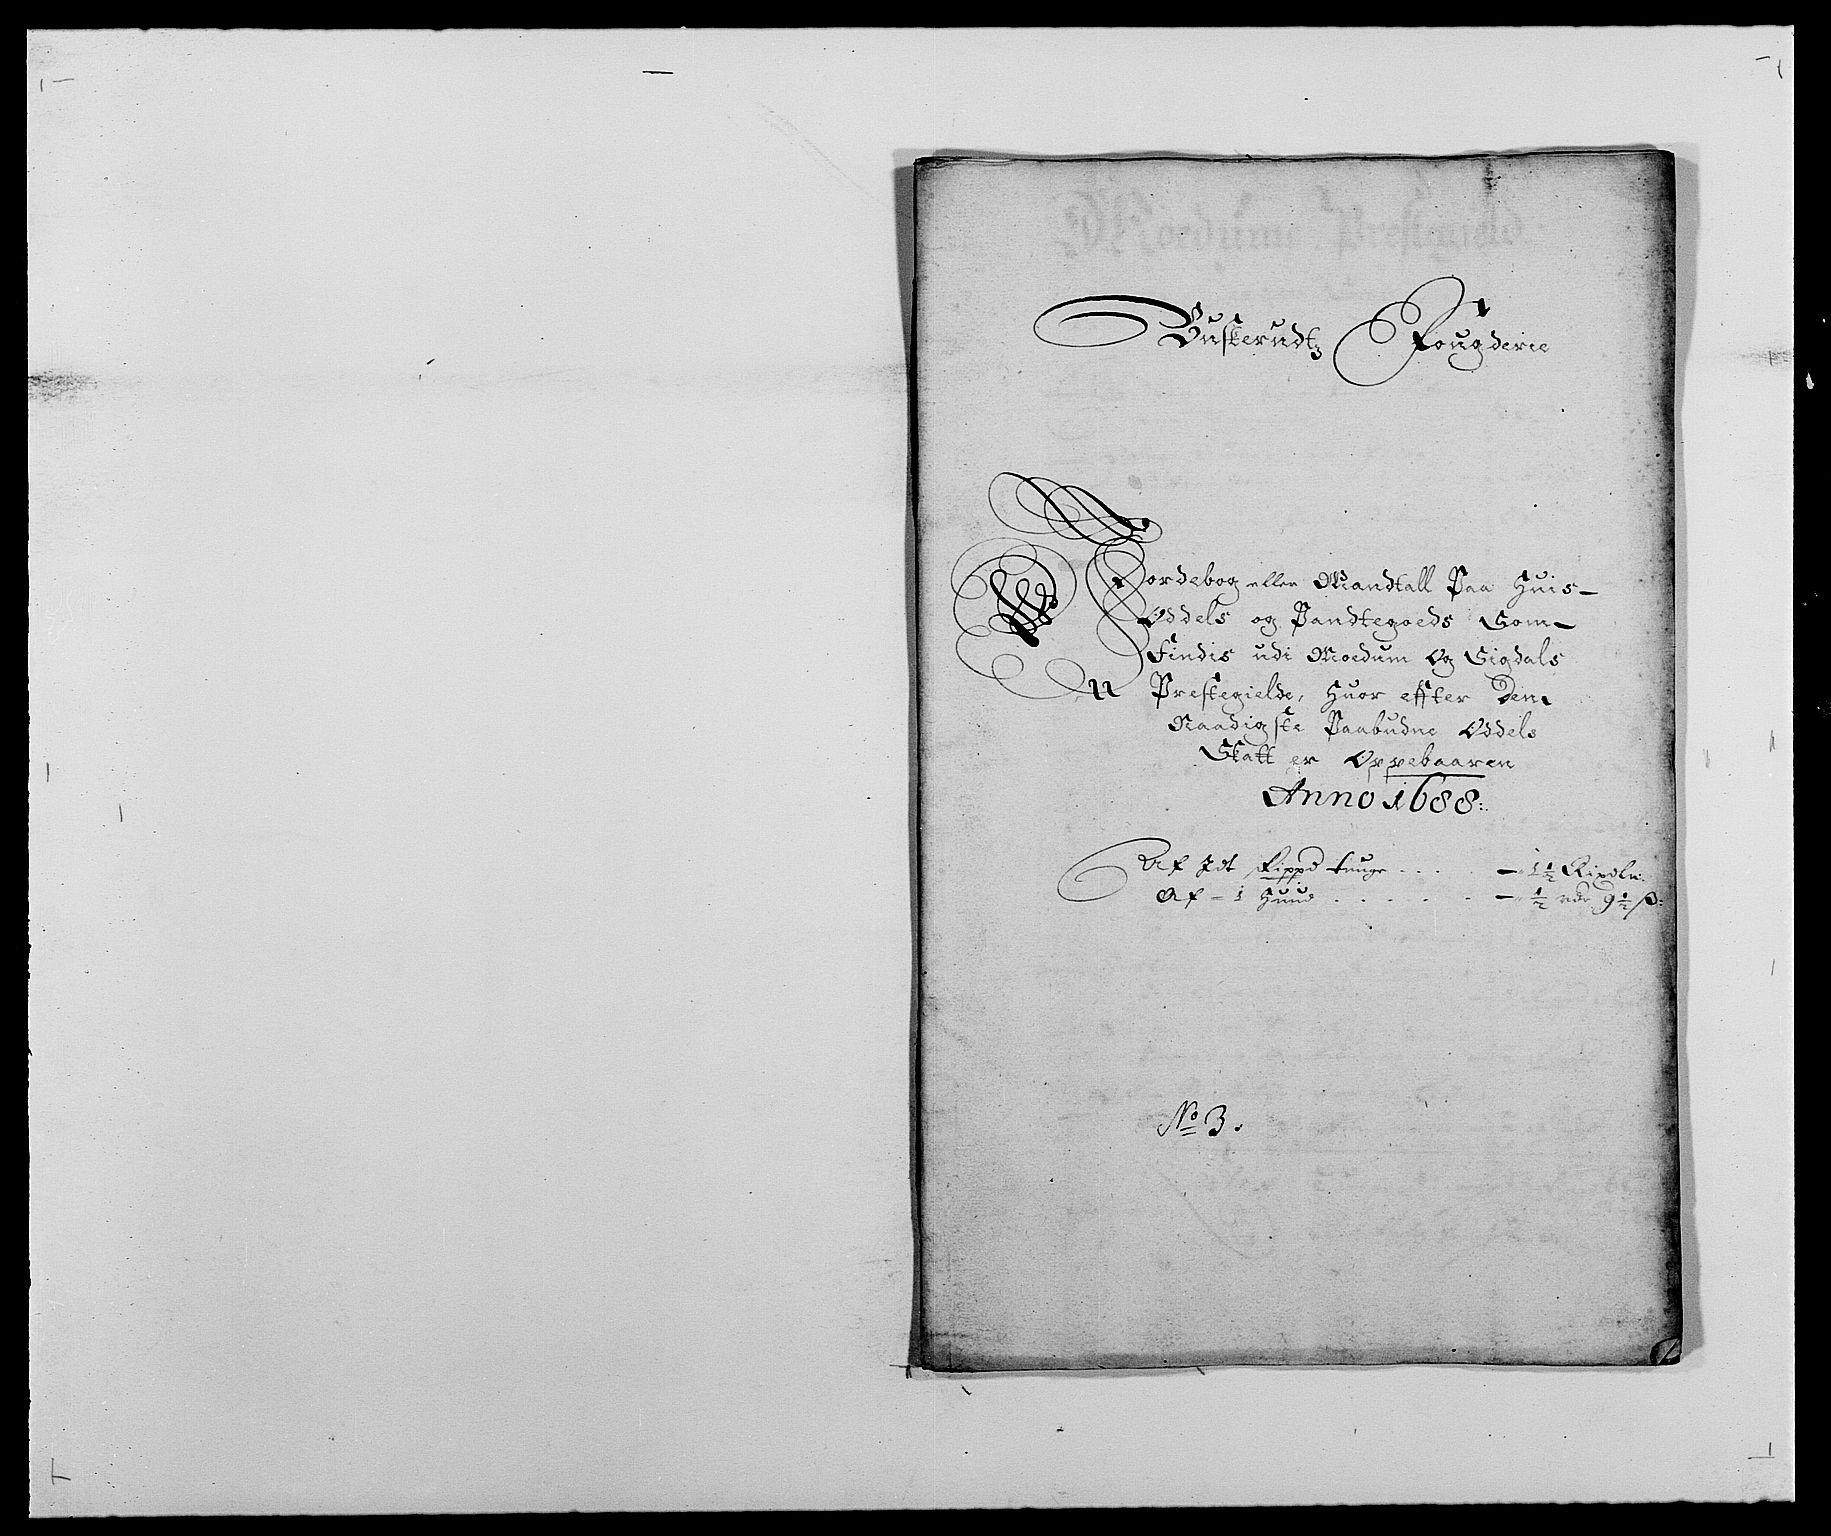 RA, Rentekammeret inntil 1814, Reviderte regnskaper, Fogderegnskap, R25/L1679: Fogderegnskap Buskerud, 1687-1688, s. 393